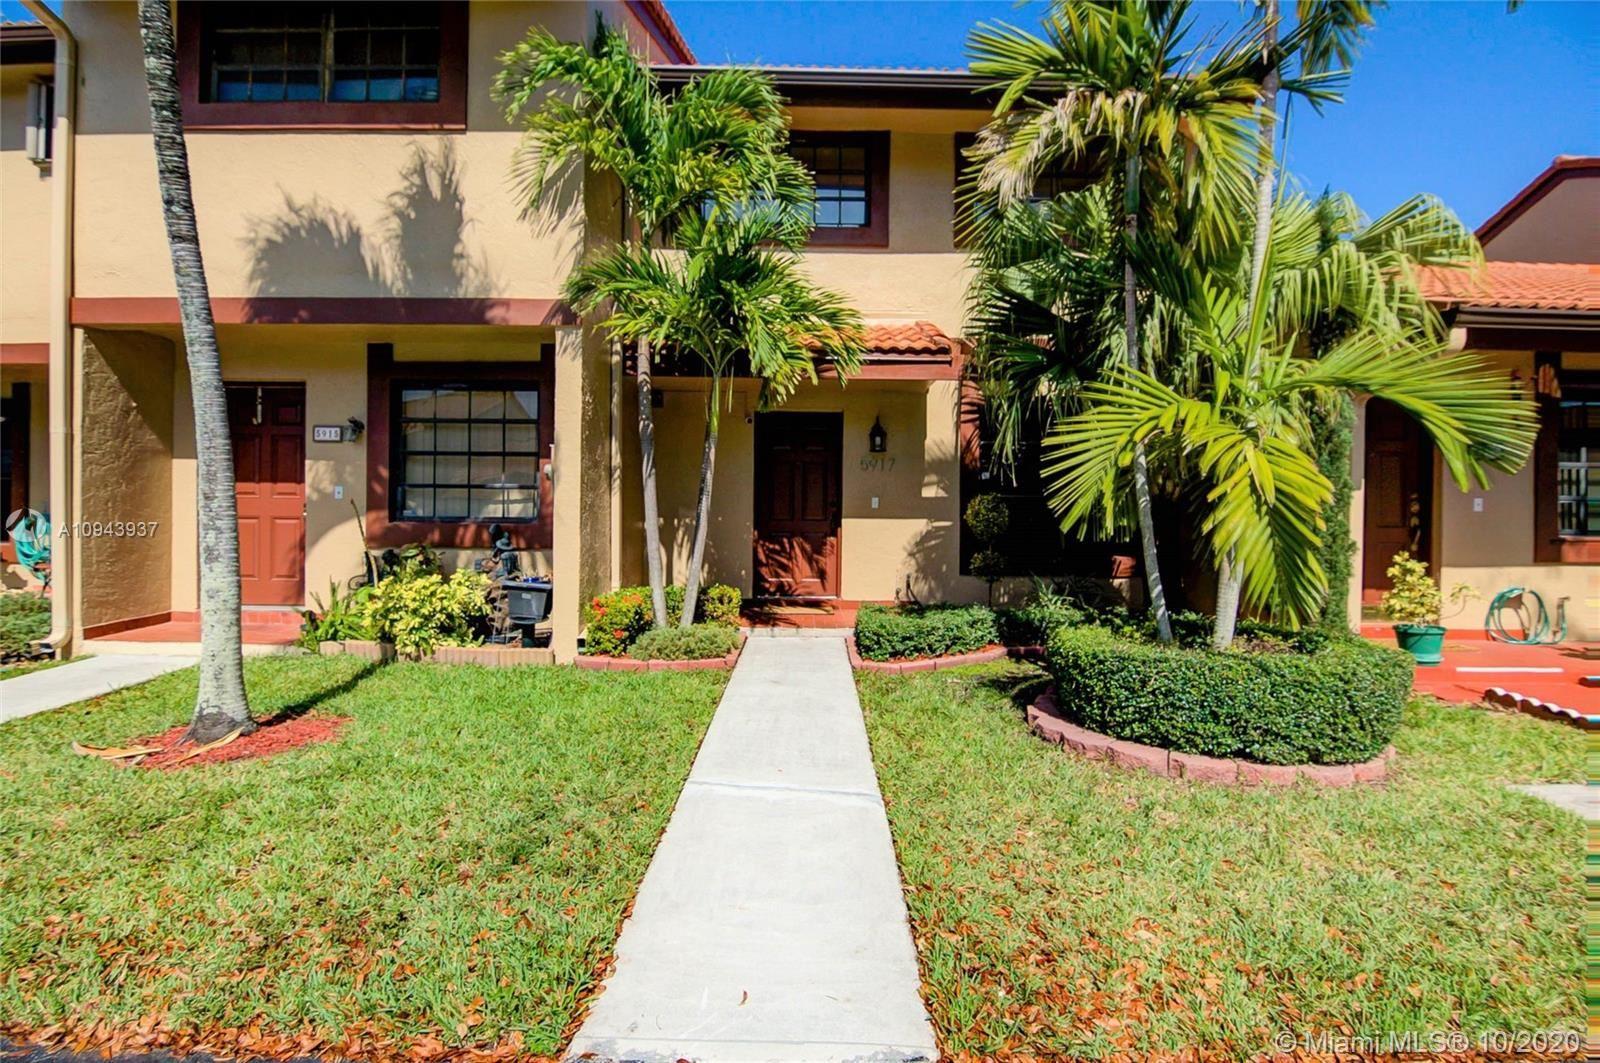 5917 SW 133rd Pl #0, Miami, FL 33183 - #: A10943937